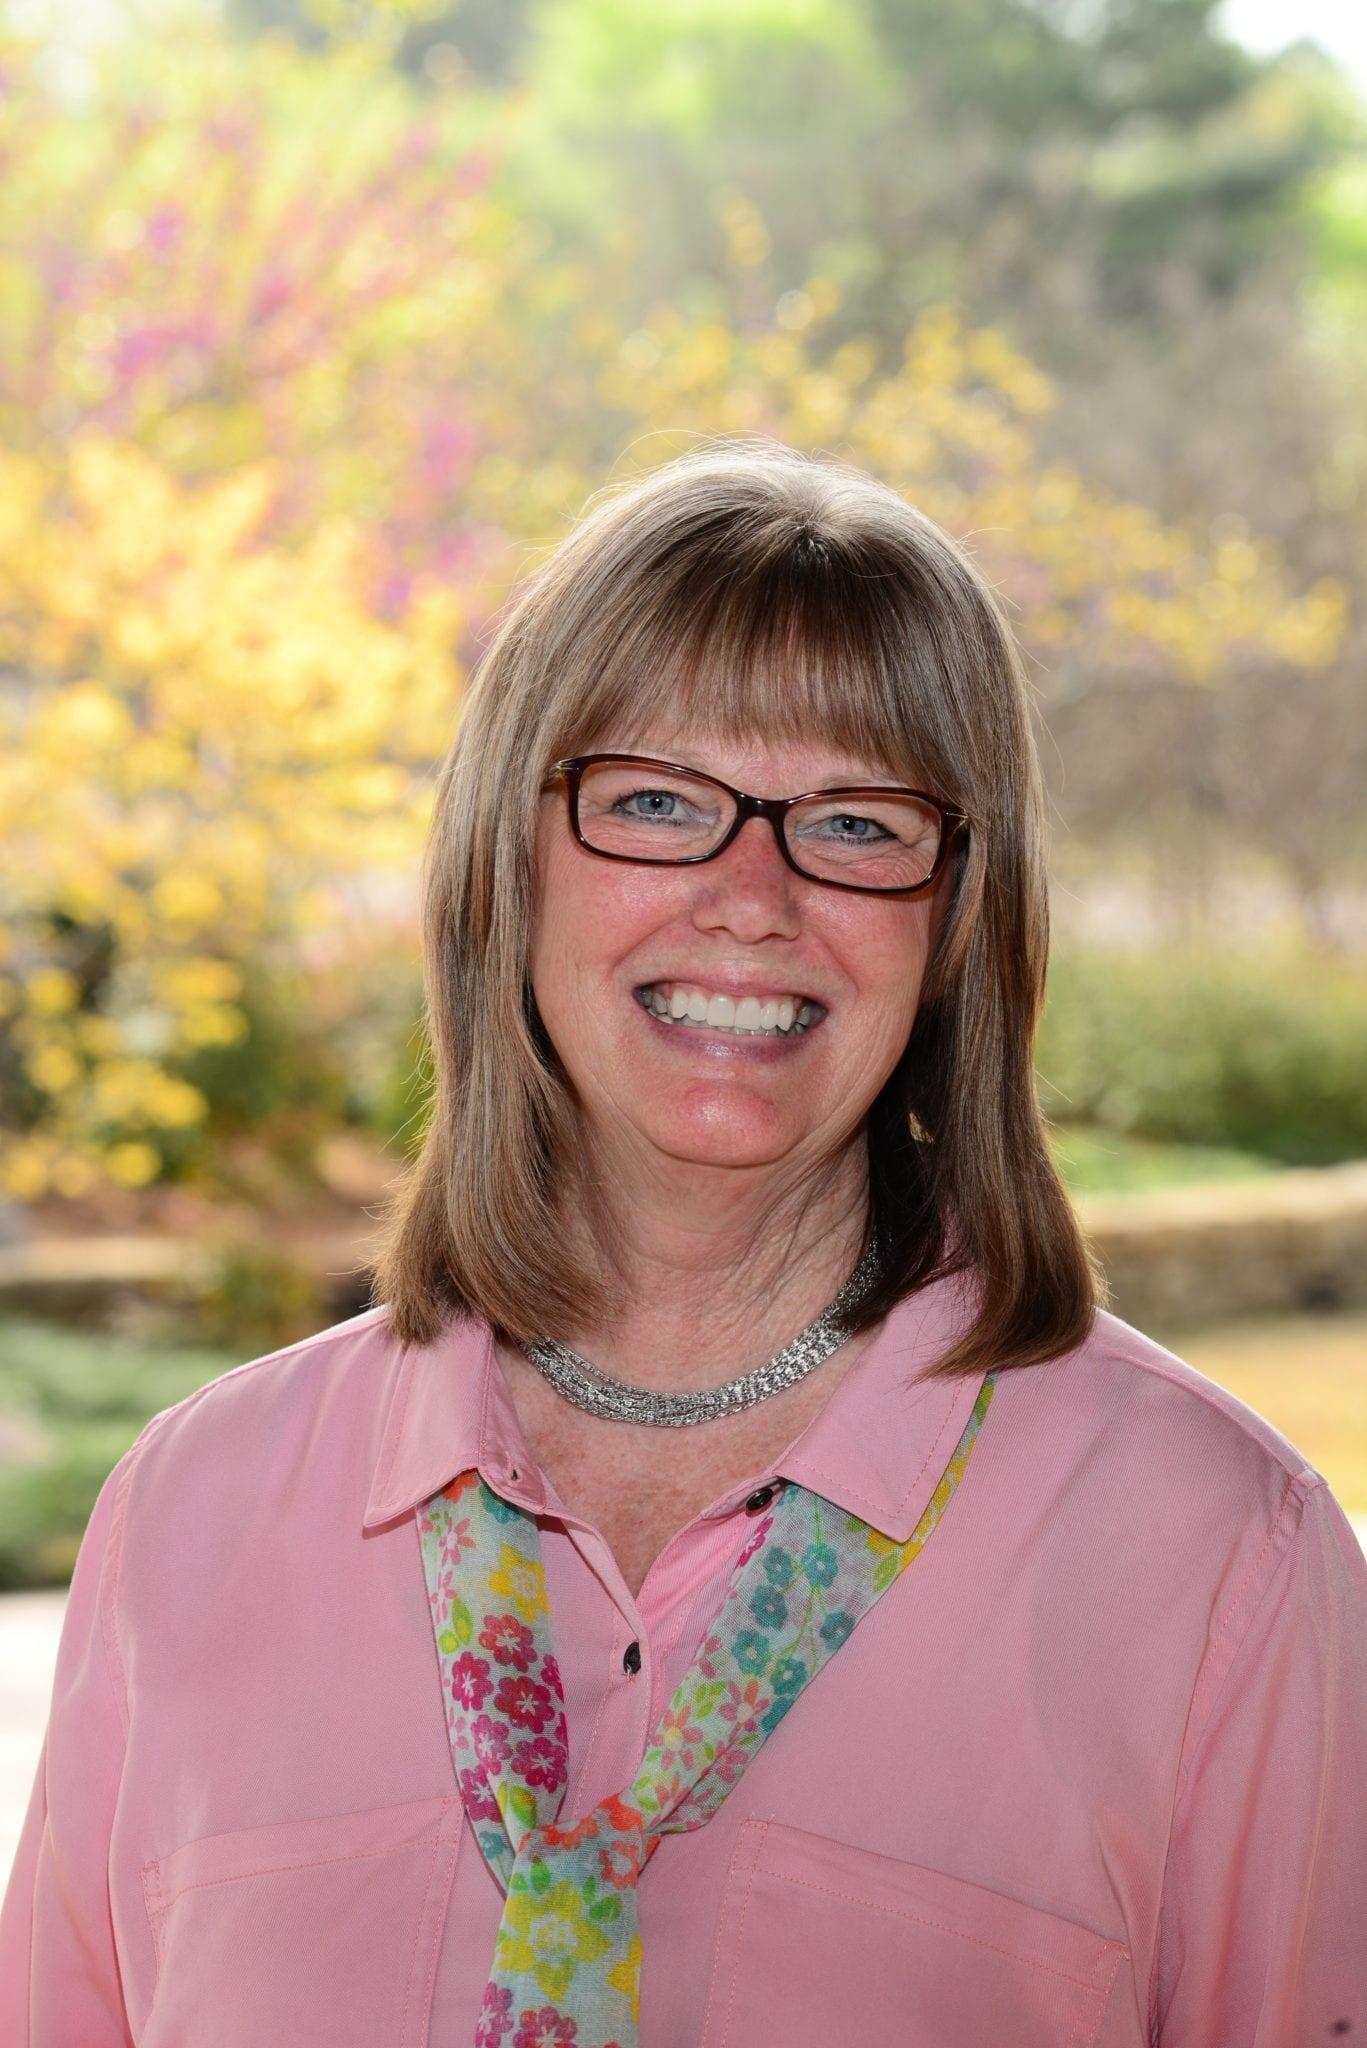 Margie Shafer, KVNE Director of First Impressions